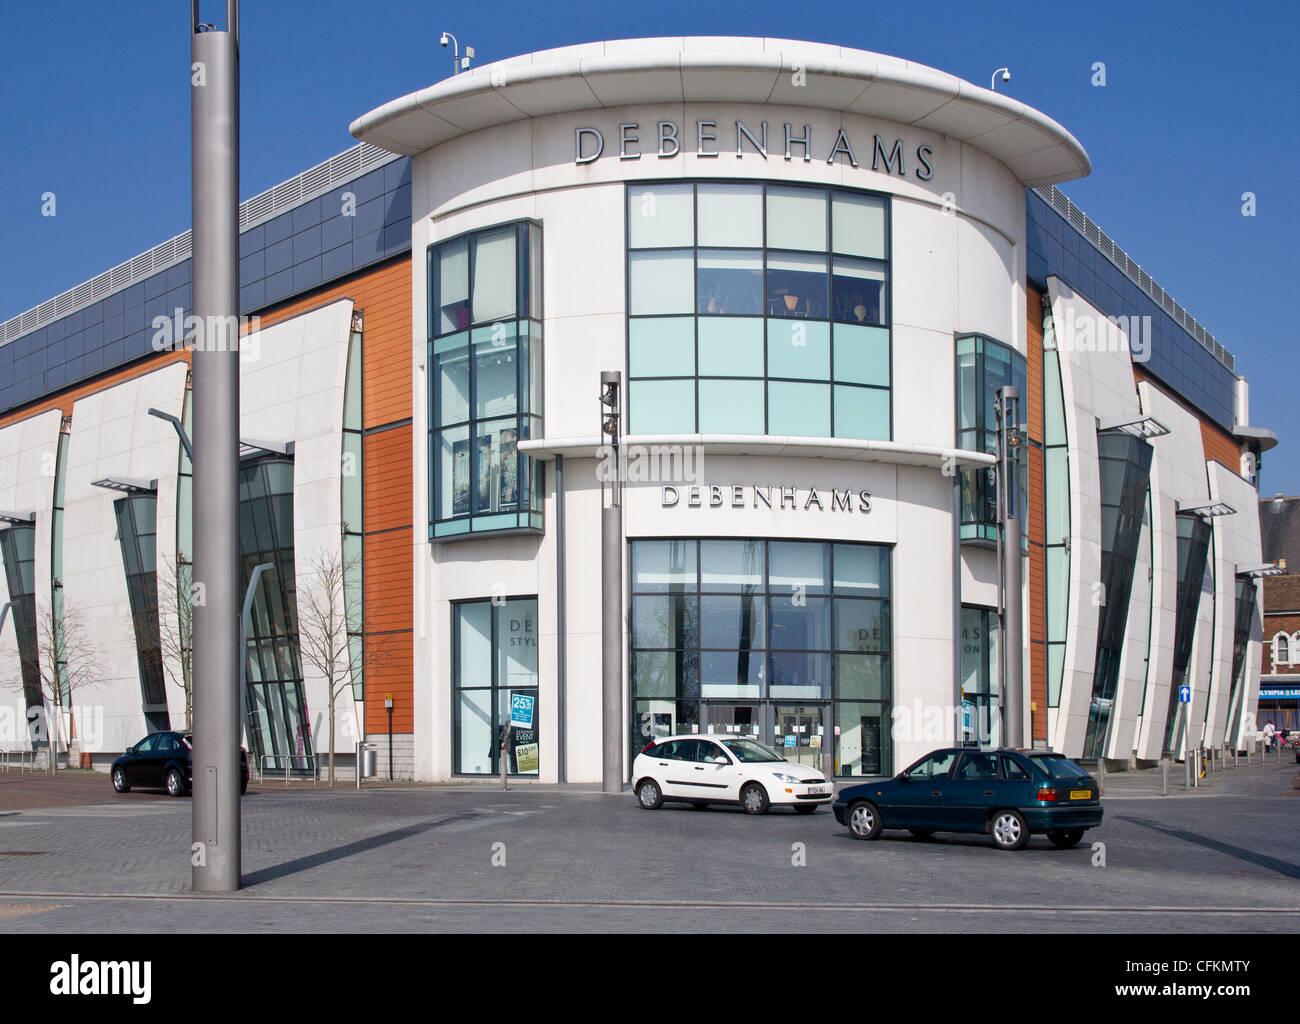 Debenham uk online shopping